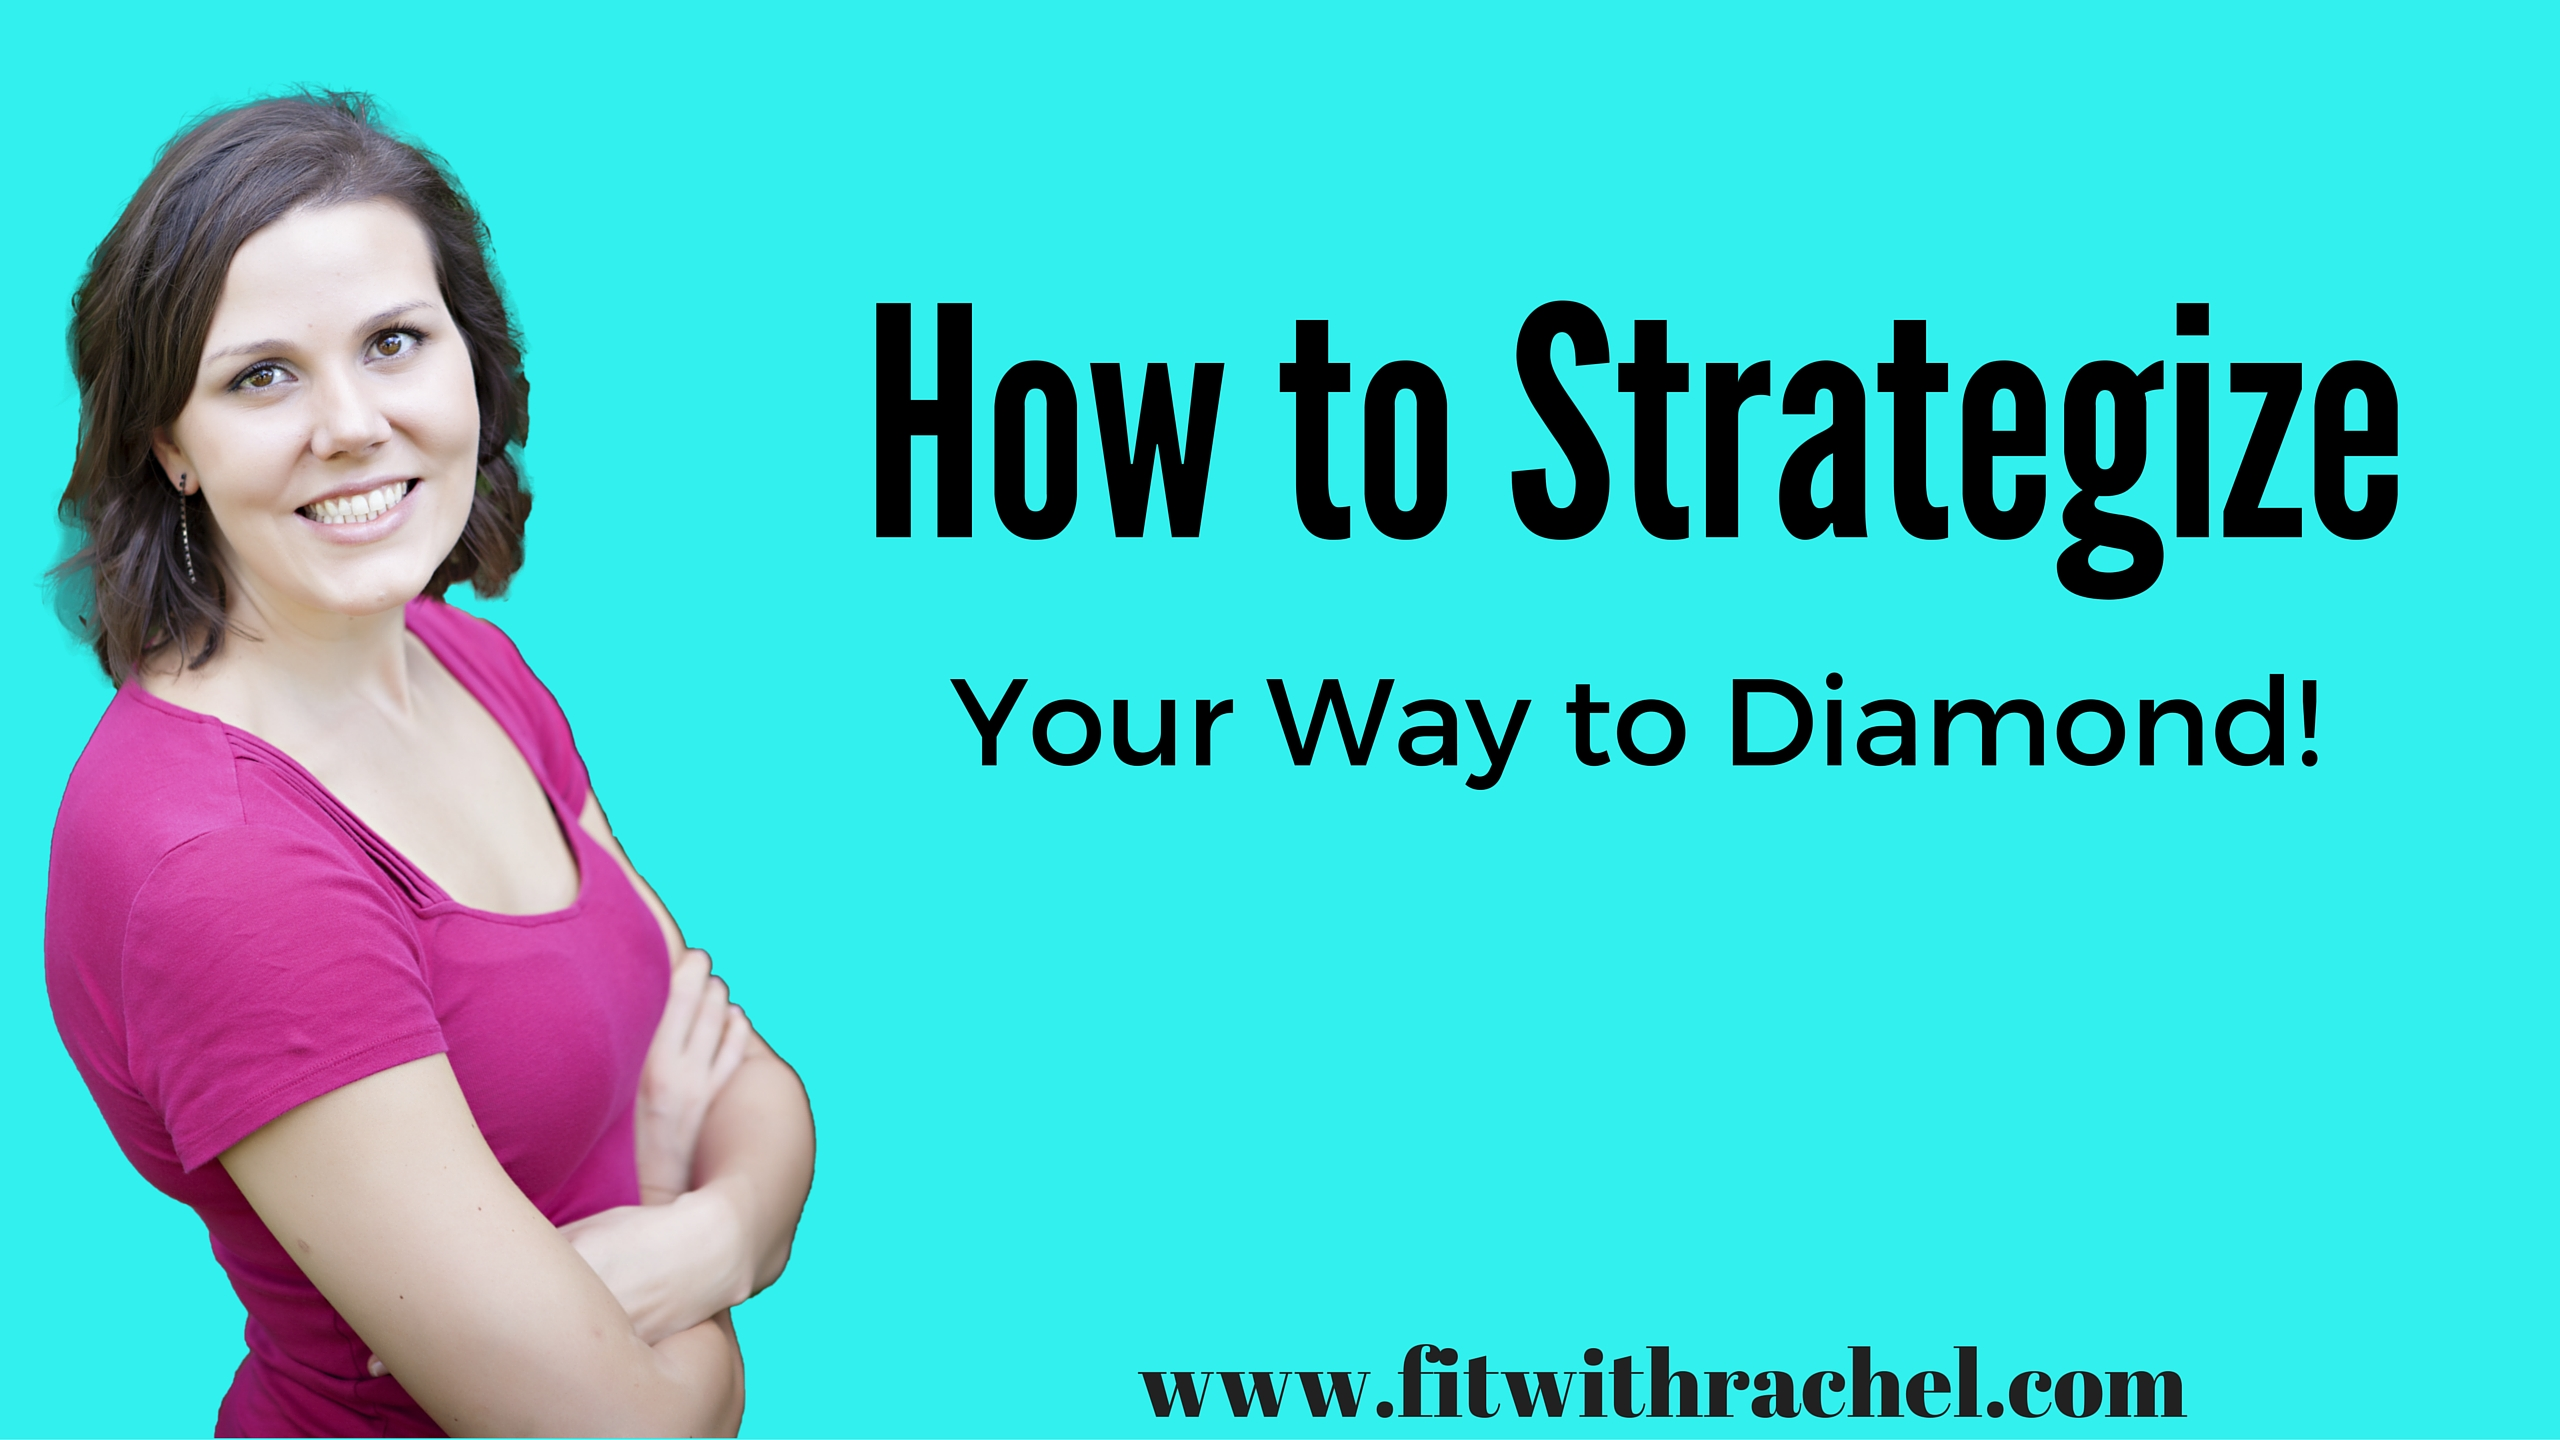 Strategizing your way to Diamond! Beachbody Coach Tip!